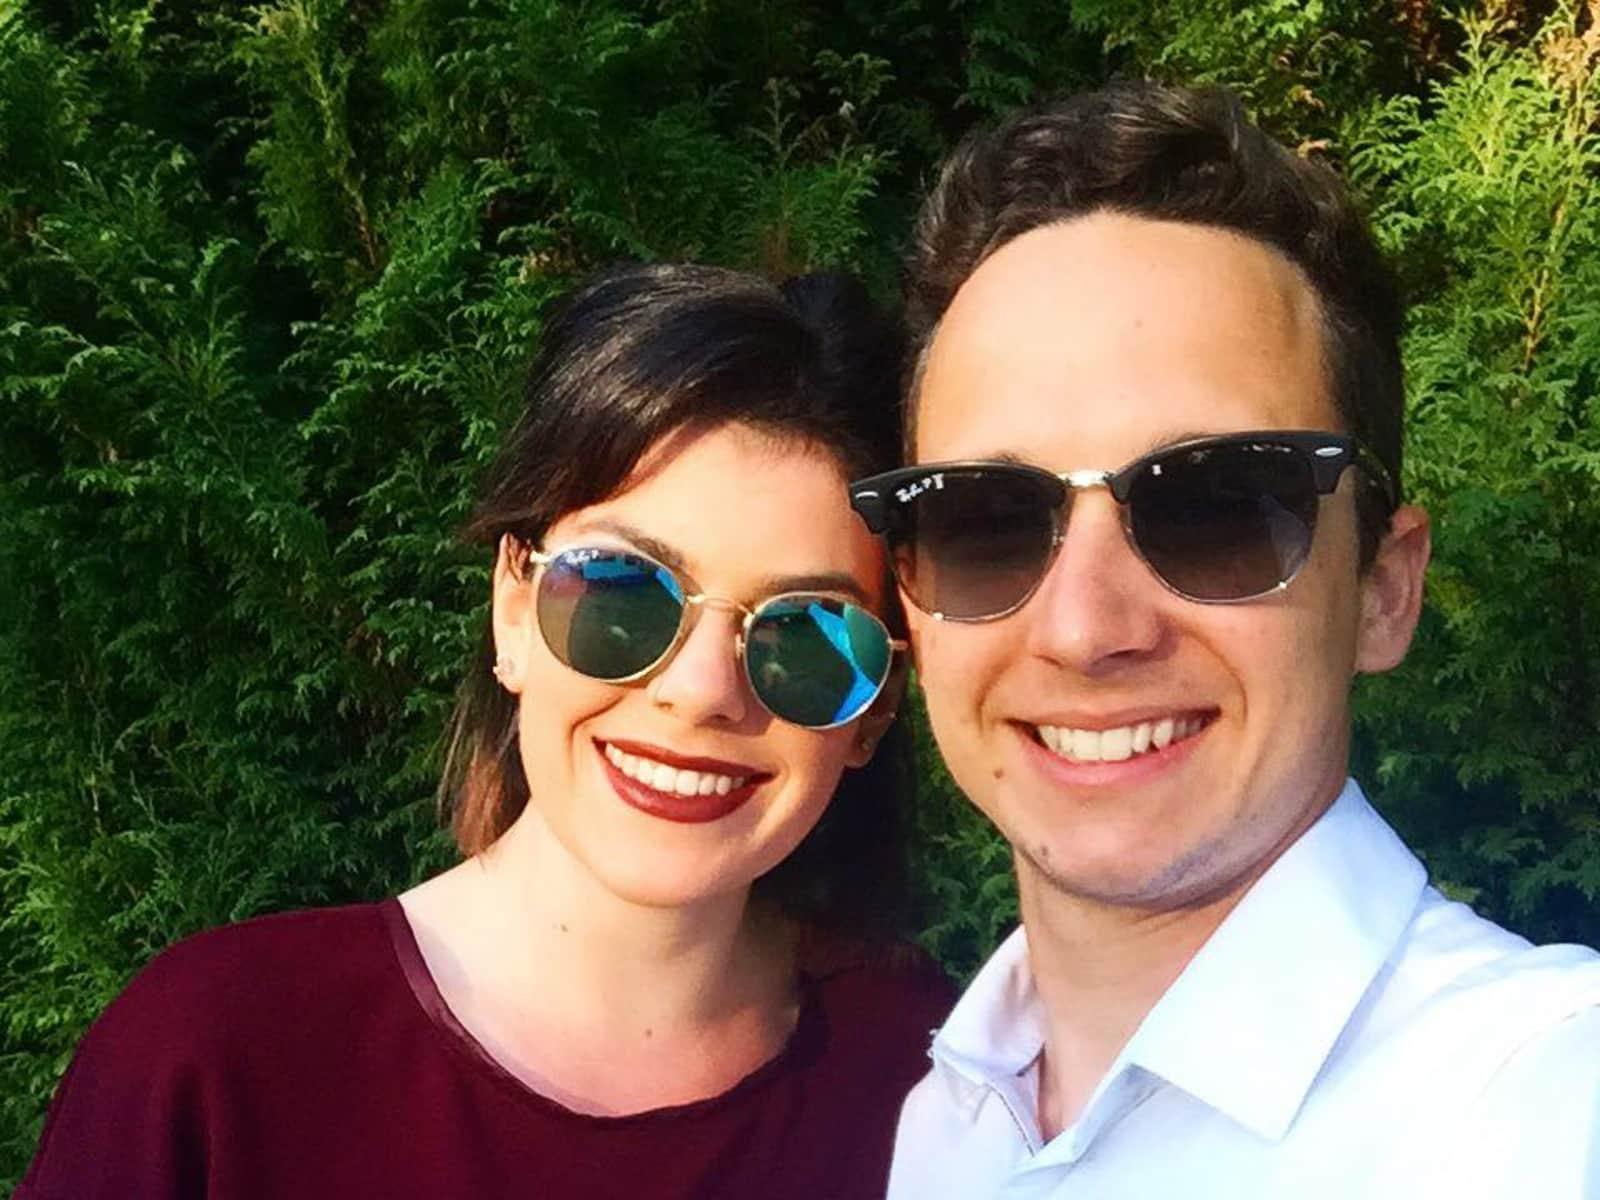 Siobhan & Jordan from Sydney, New South Wales, Australia